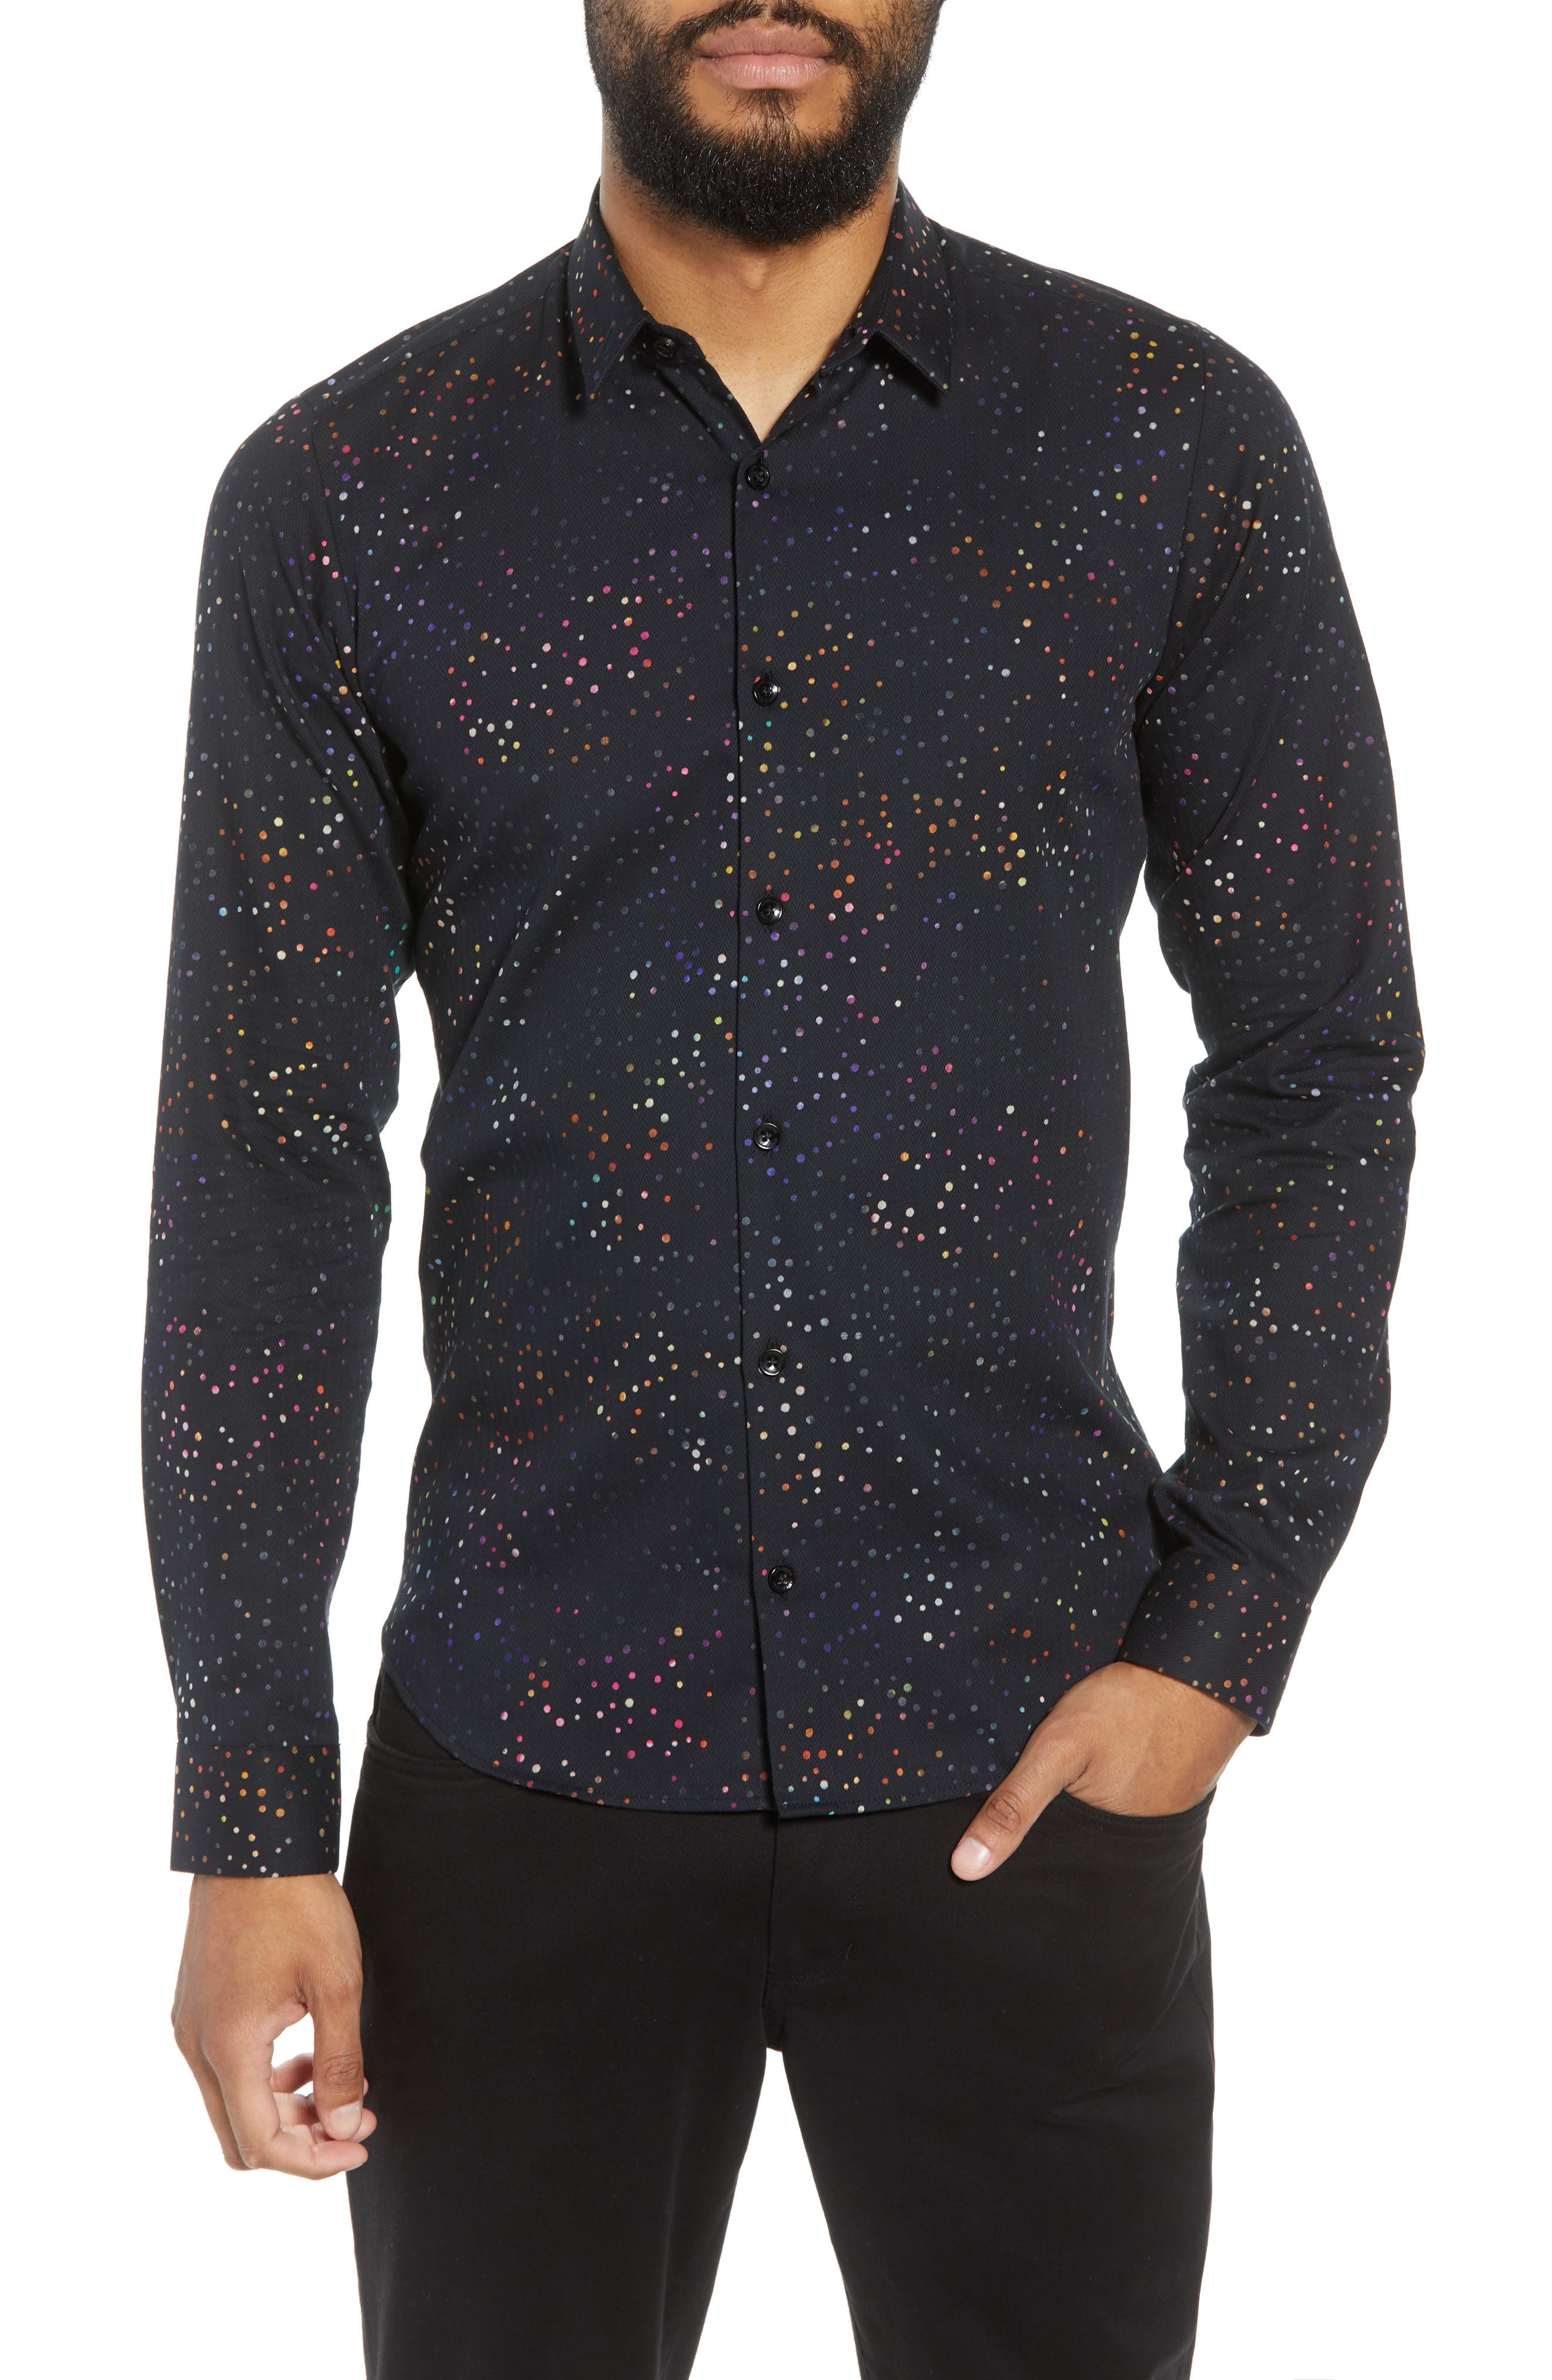 JARED LANG,                             Dot Herringbone Sport Shirt,                             Main thumbnail 1, color,                             BLACK MULTI COLORED DOTS